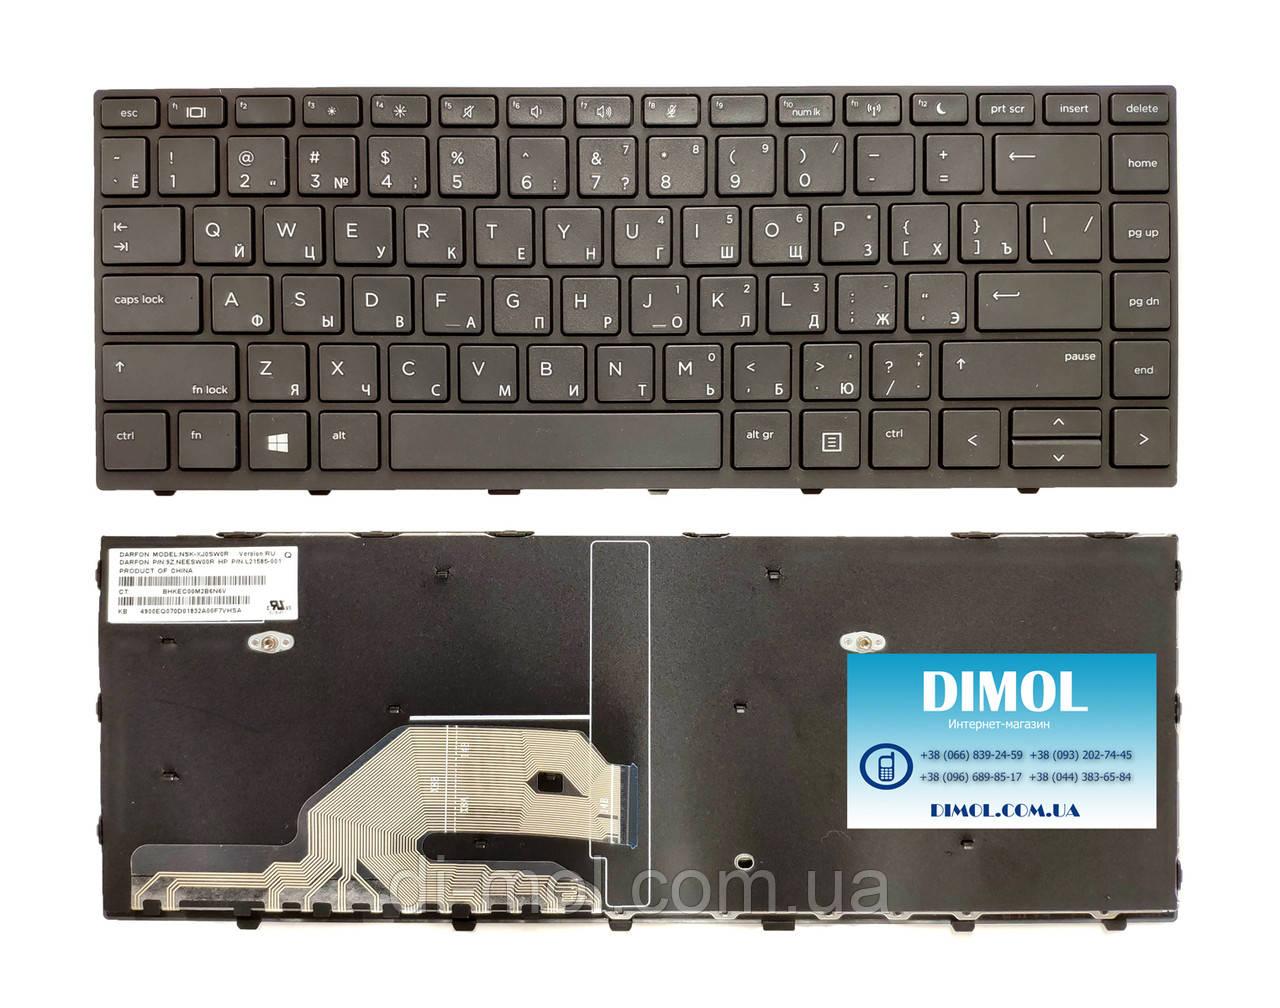 Оригінальна клавіатура для ноутбука HP Probook 430 G5, Probook 440 G5, Probook 445 G5 rus, black